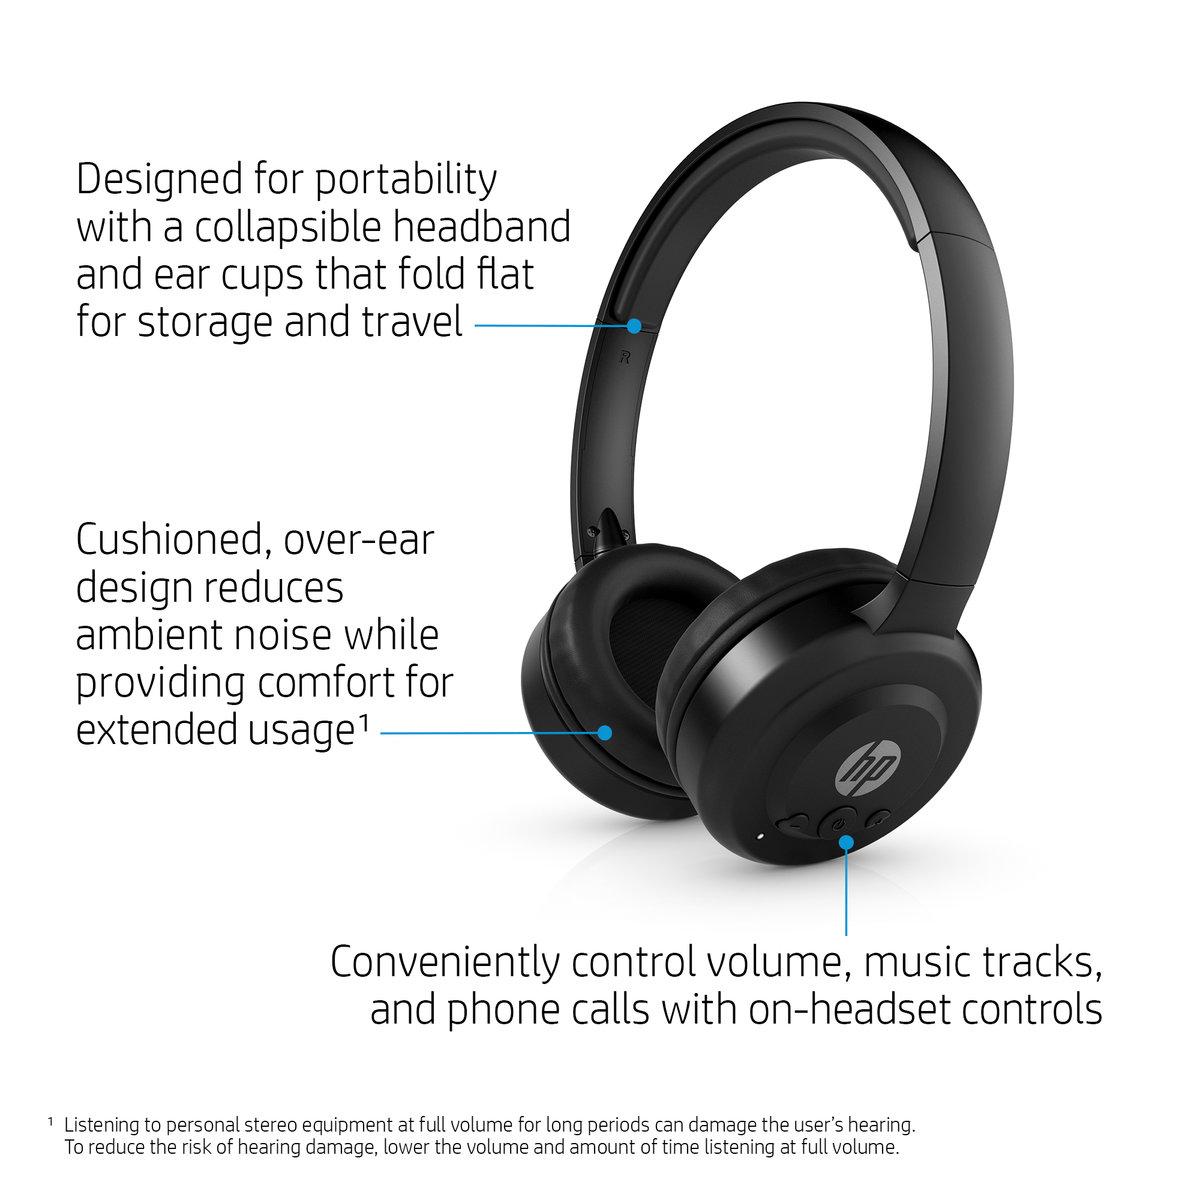 HP Pavilion Bluetooth® Headset 600 HP